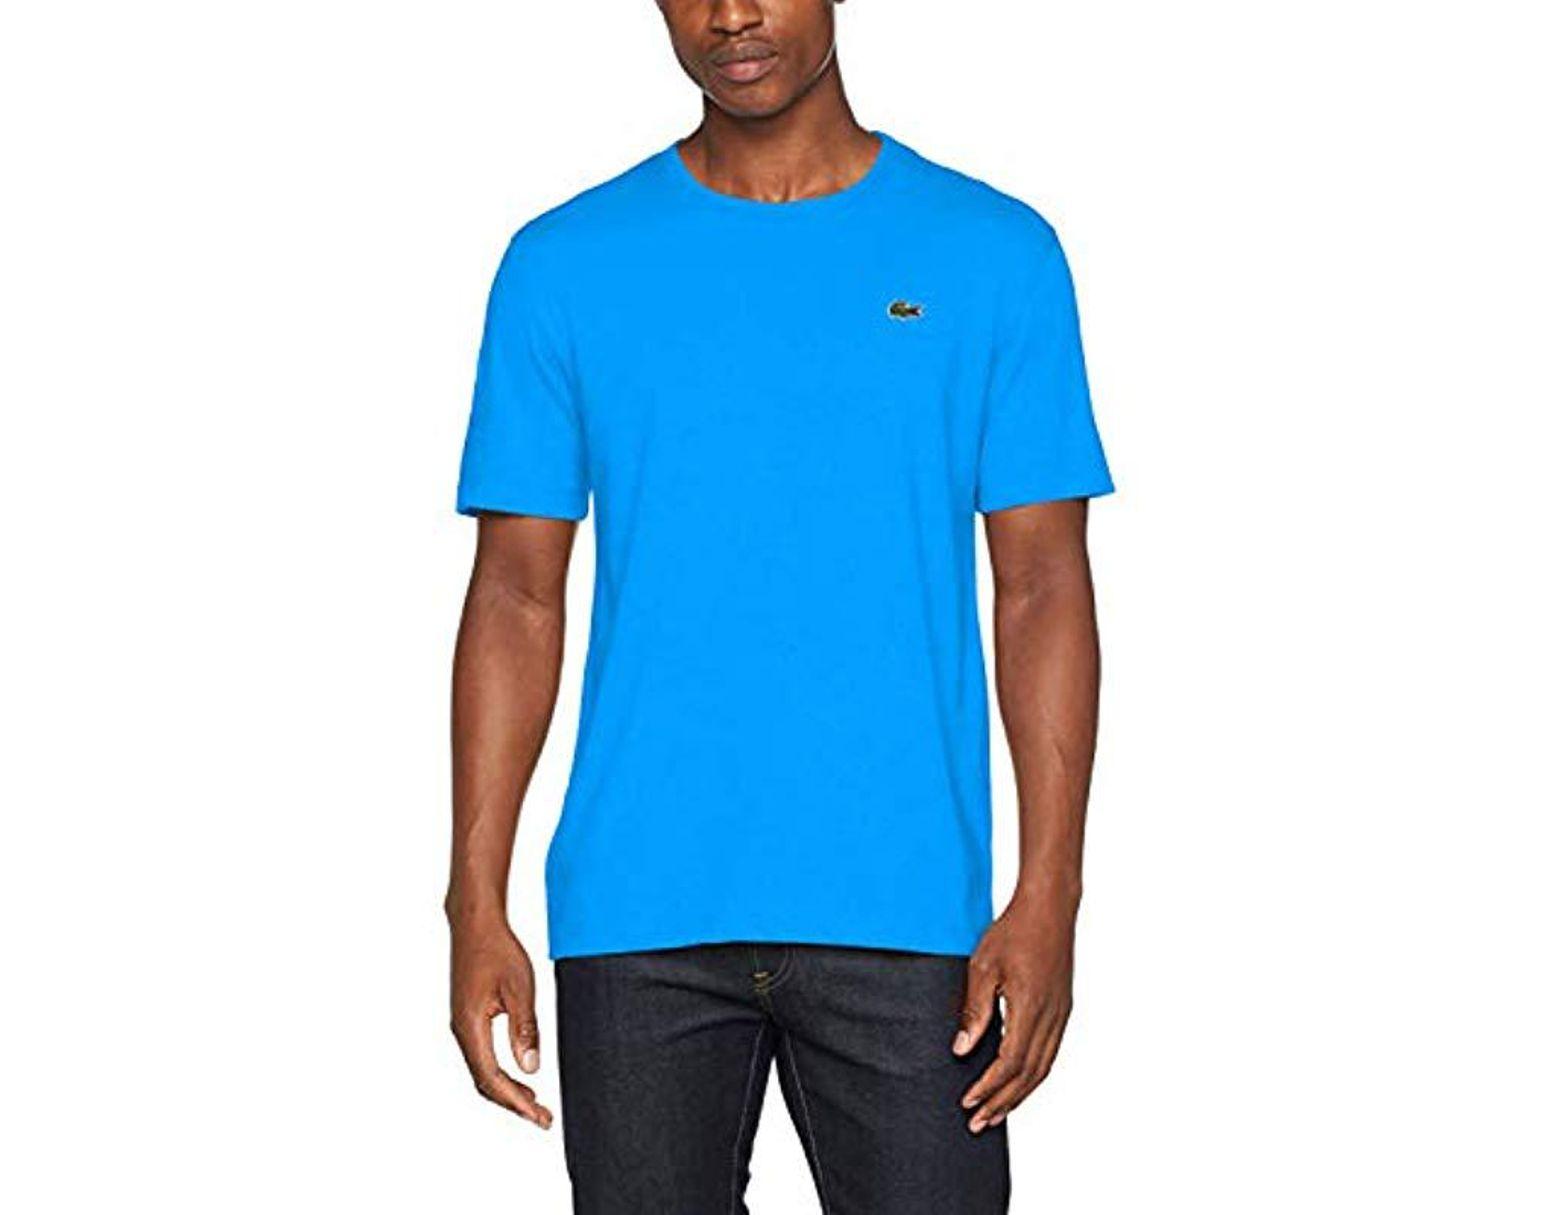 a355c2fad Lacoste T-shirt in Blue for Men - Lyst